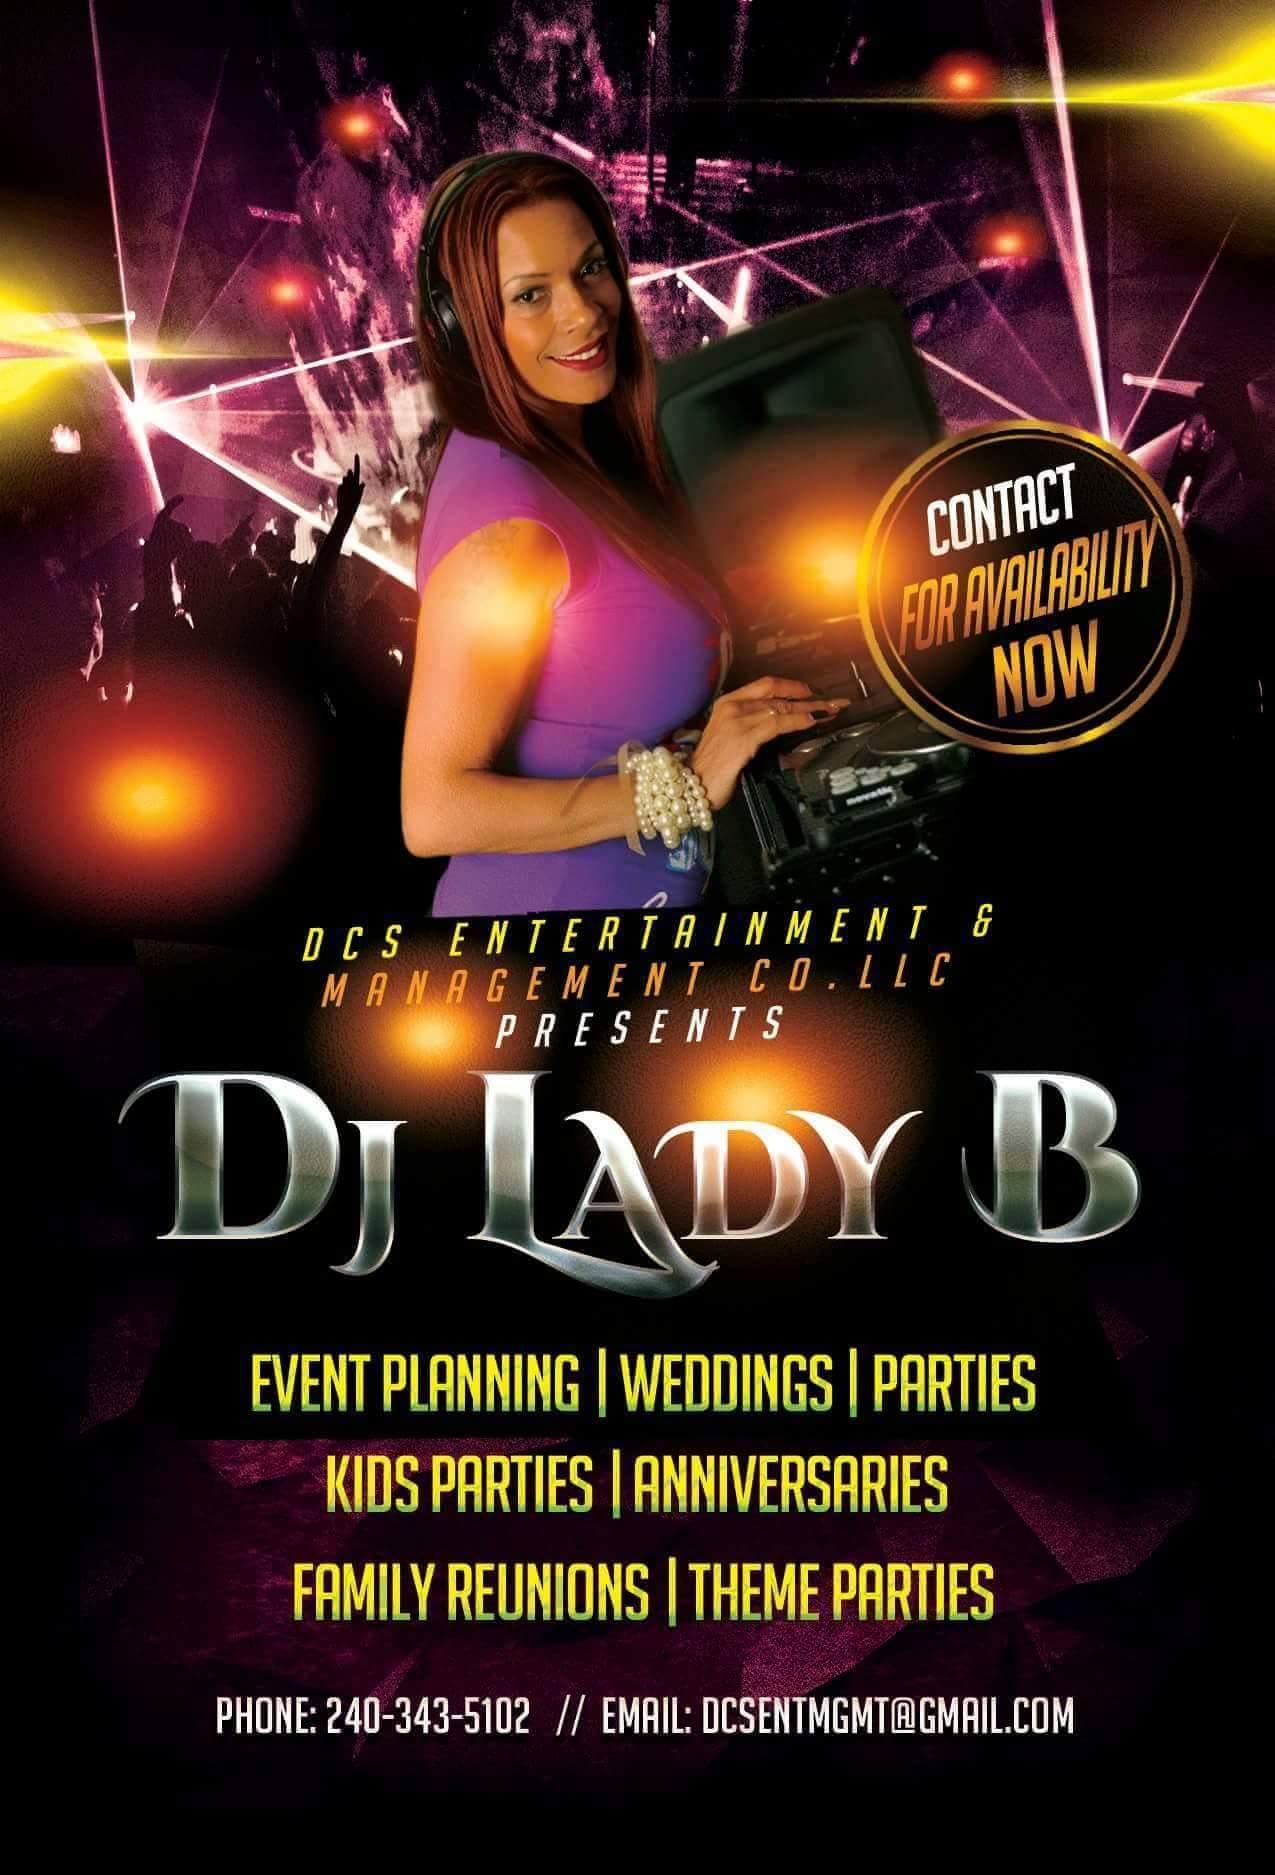 DCS Events Dj Lady B